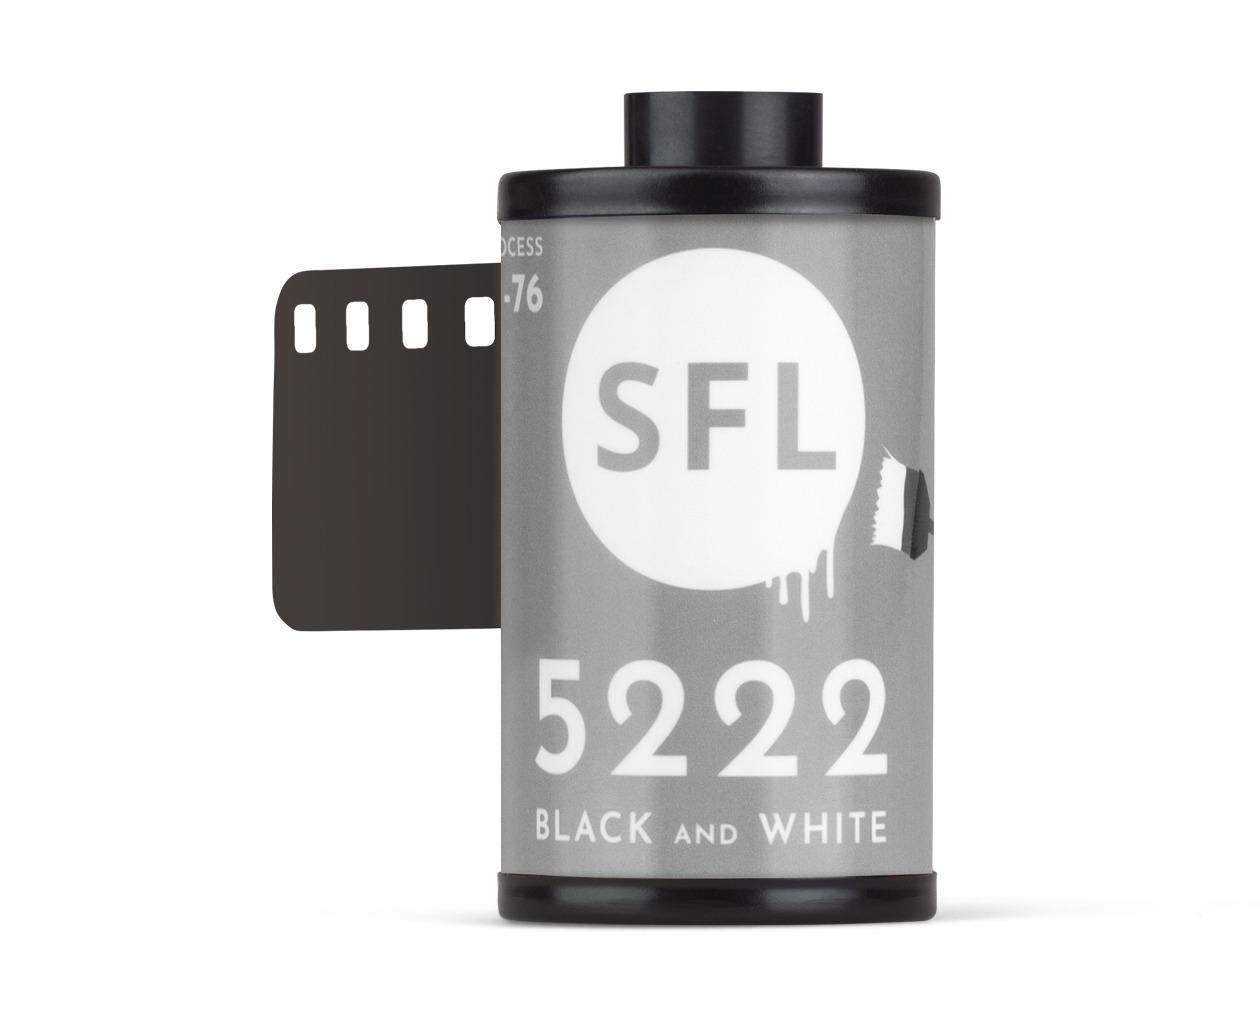 фотопленка sfl kodak double-x 5222 (135/36) ч/б негативная в кассете